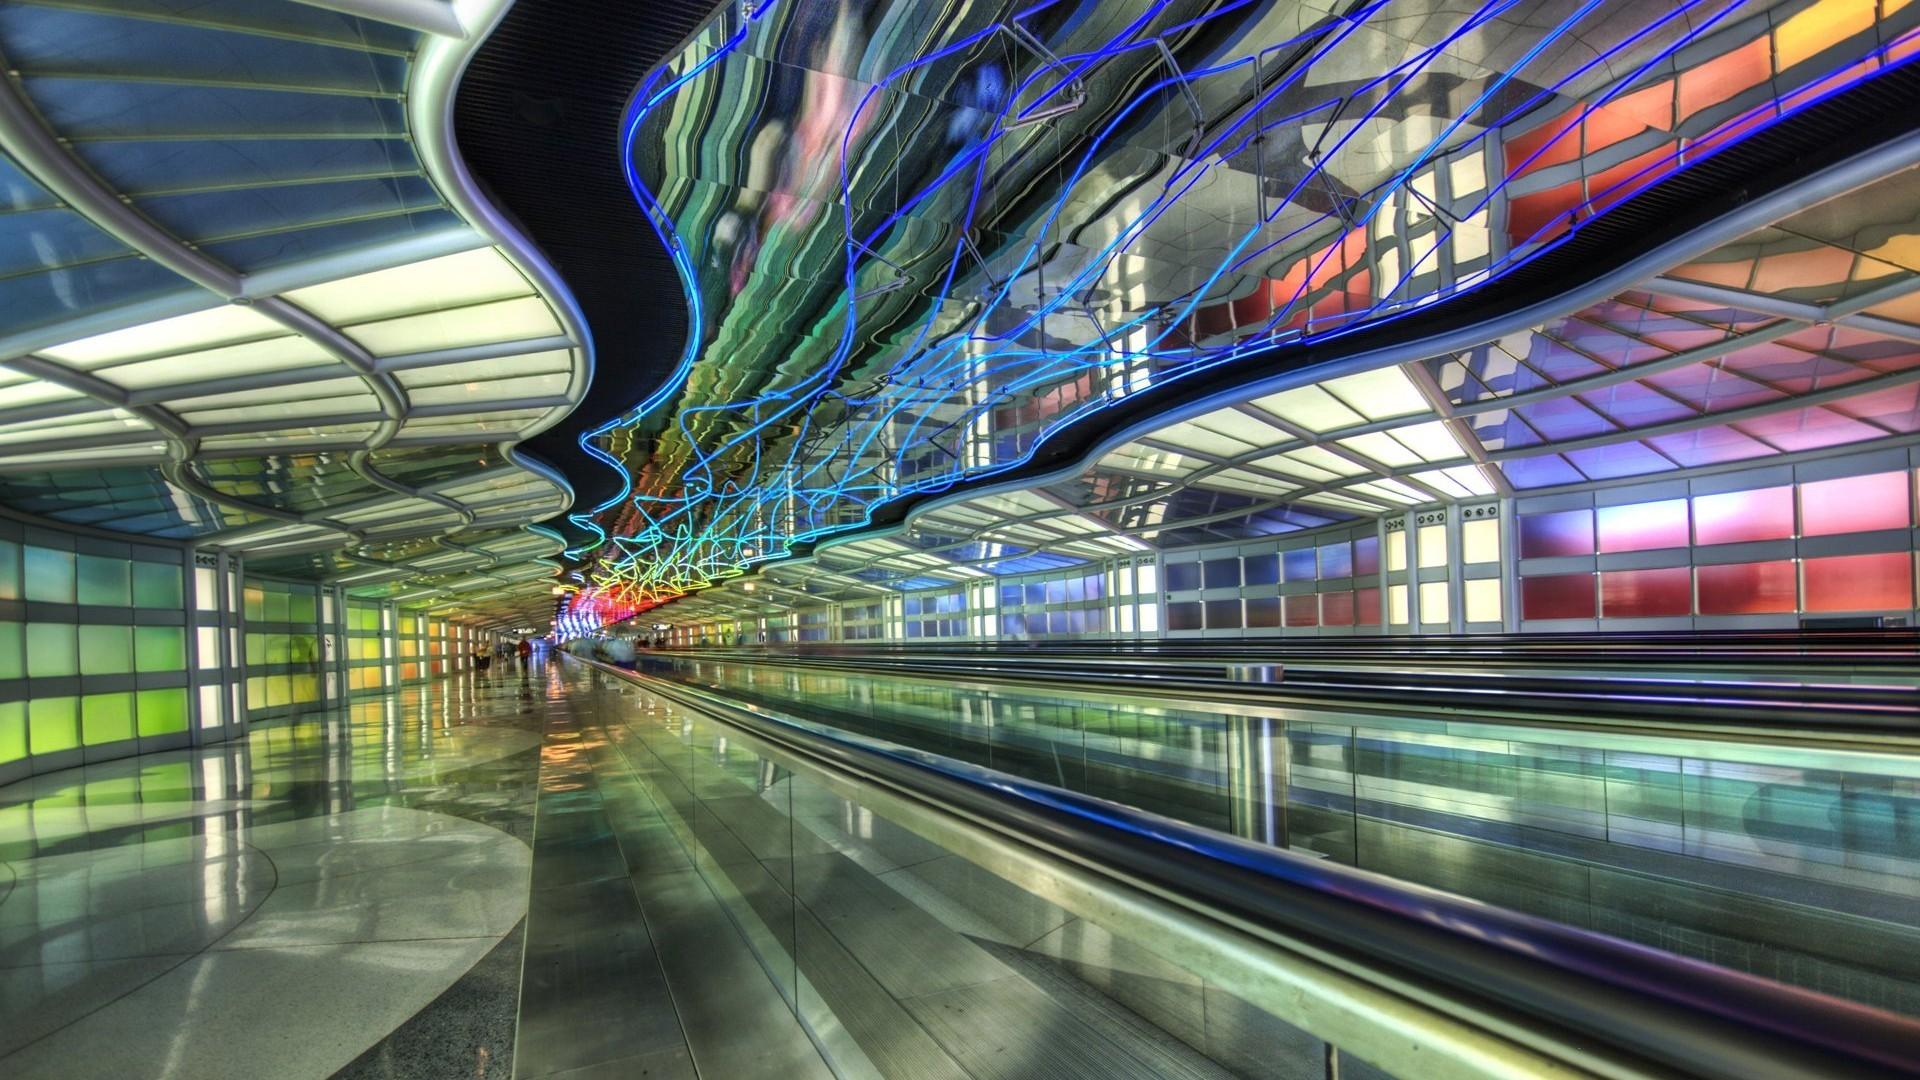 Sfondi architettura 67 immagini for Programmi architettura 3d gratis